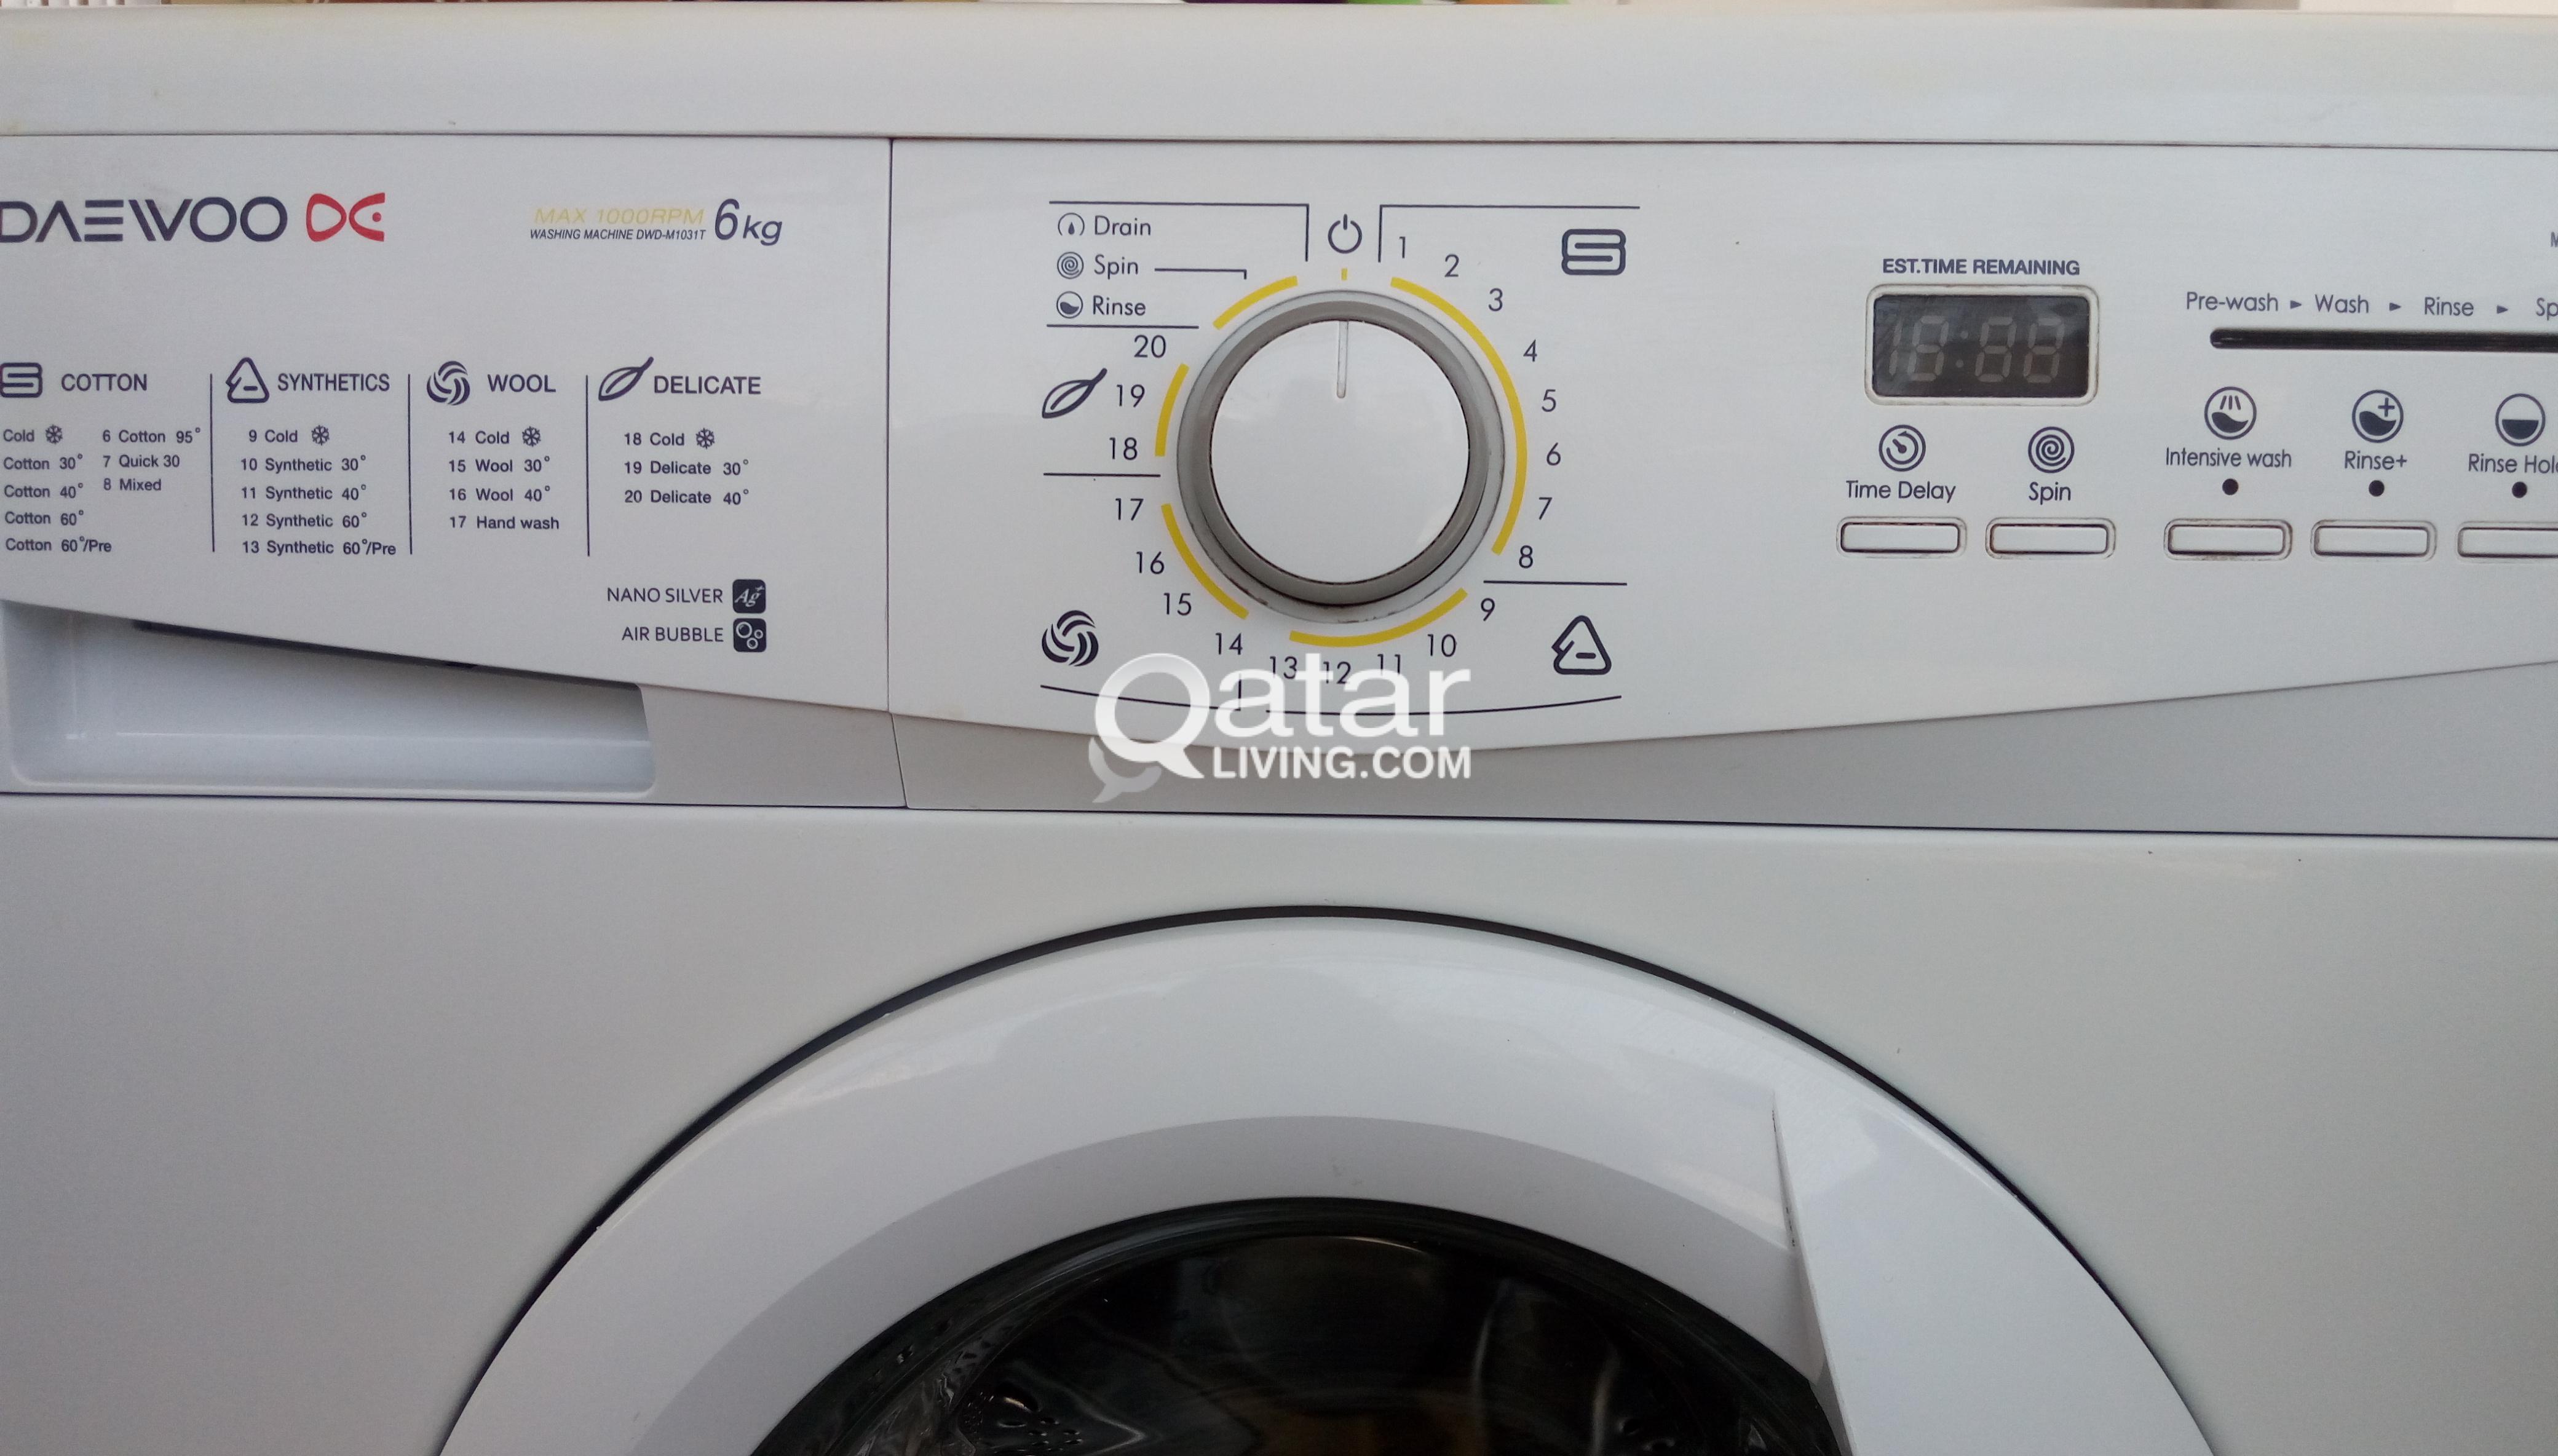 Daewoo washing machine for parts | Qatar Living